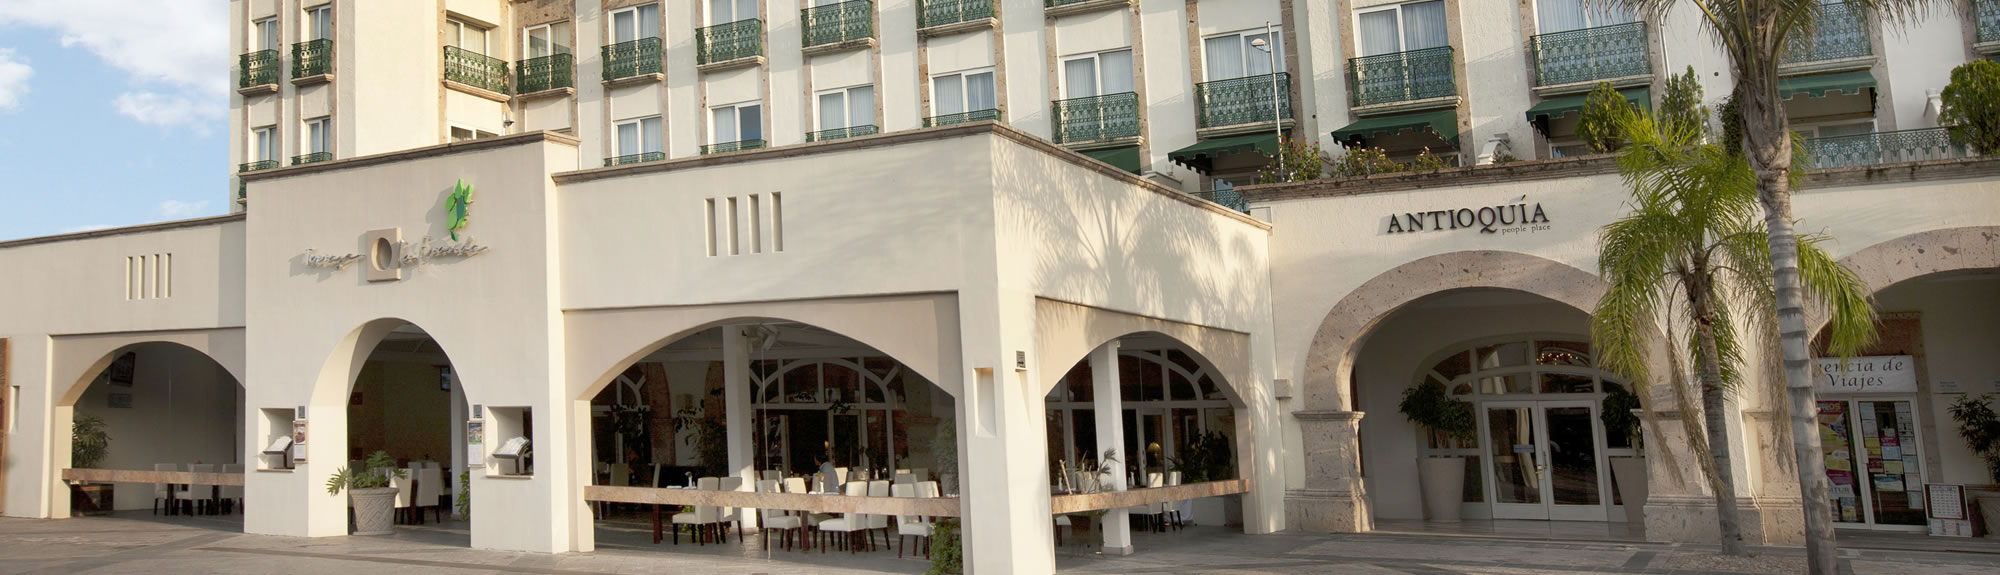 Hotel 5 estrellas en Aguascalientes